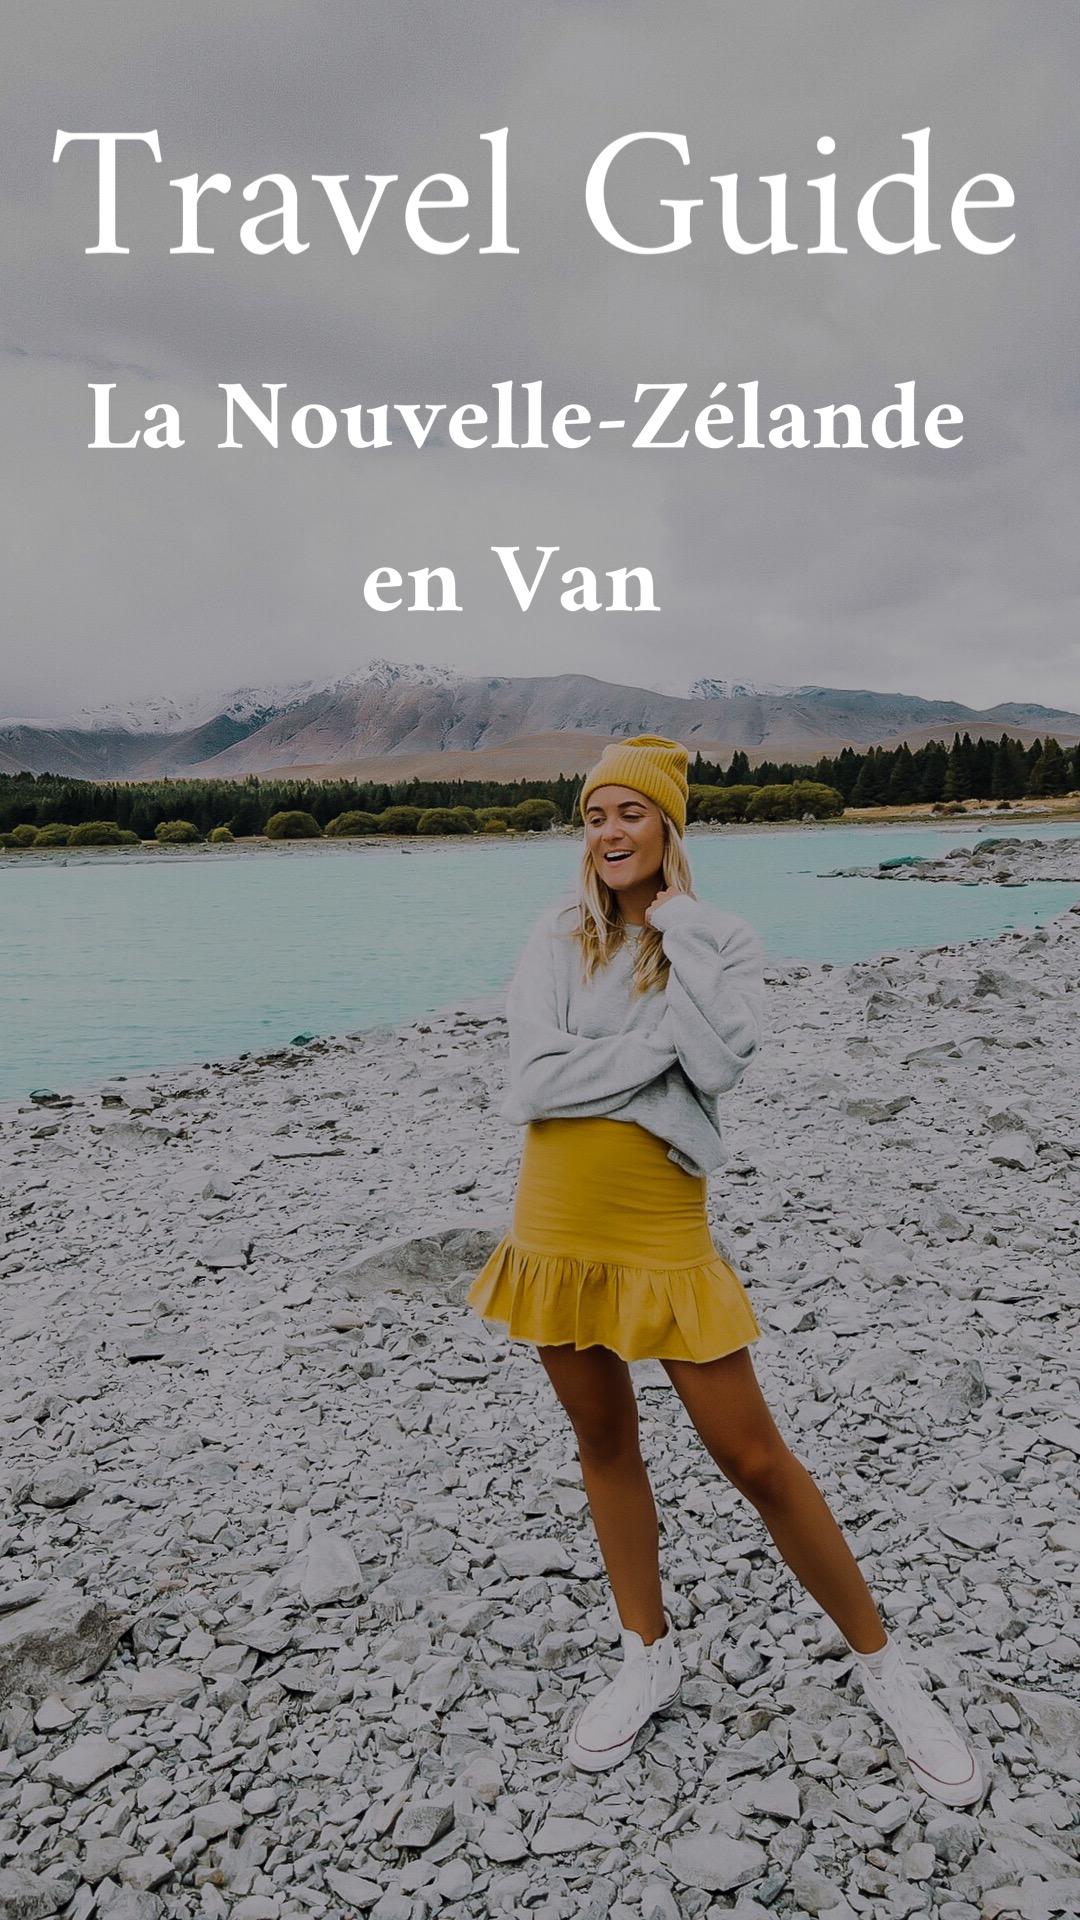 Guide voyage roadtrip en van en Nouvelle-Zélande - Blondie Baby blog voyages et mode